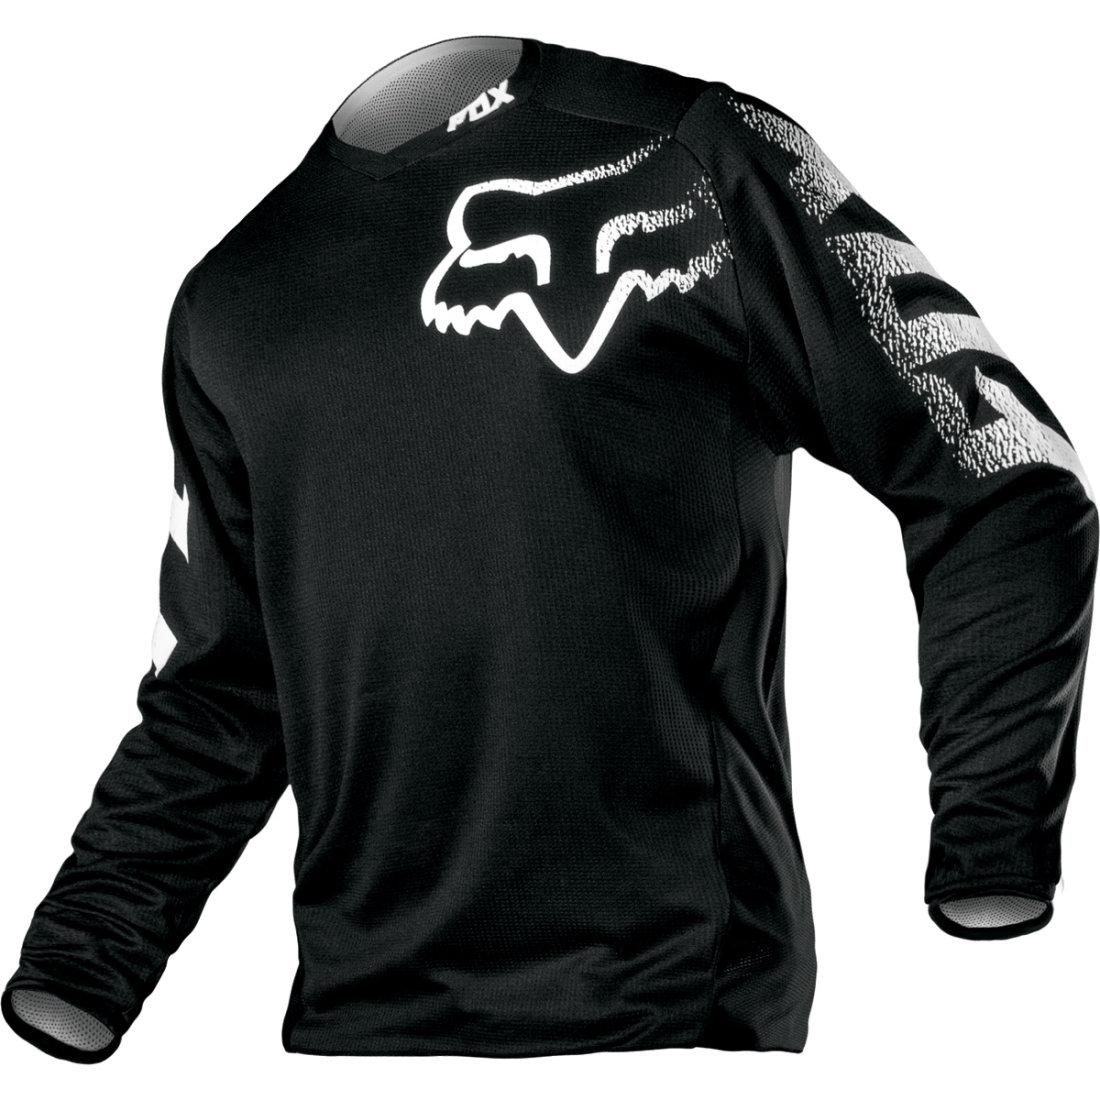 4a8f1f6d1e4 191 Camisetas para motocross